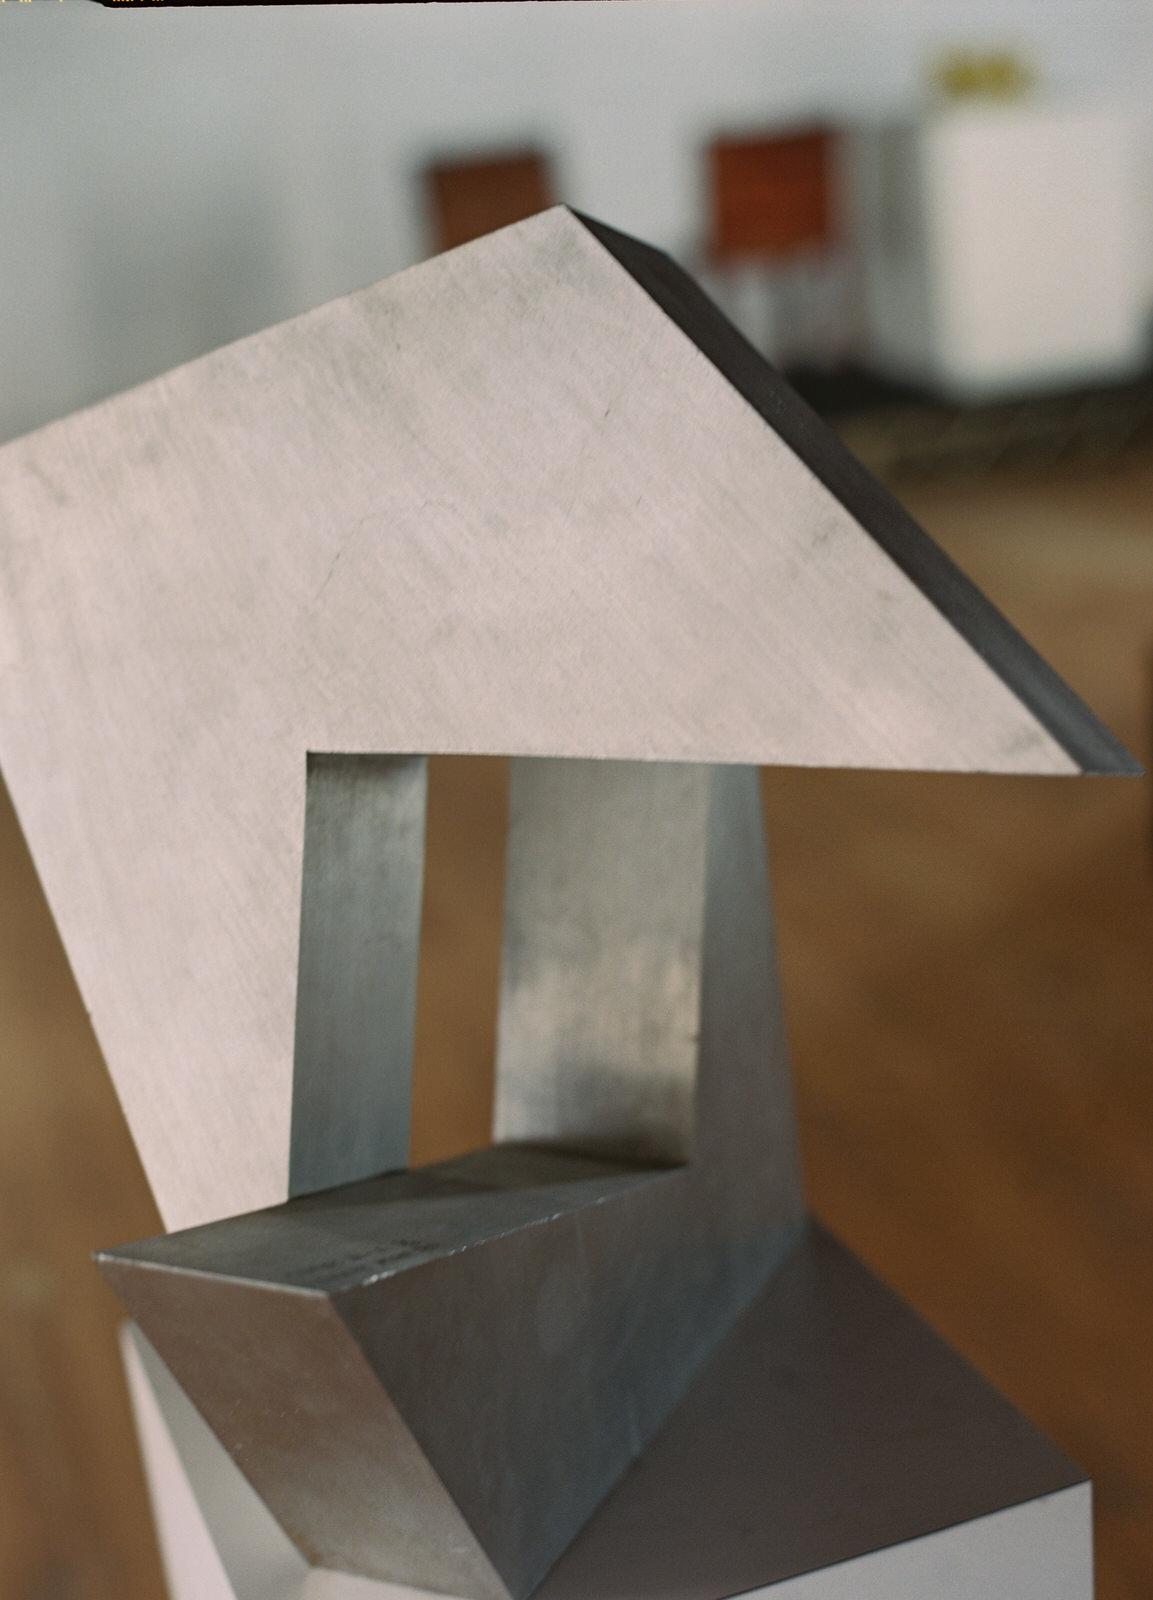 Sized, Exhibition, Justin Chung, Los Angeles, Offsite.studio, Kodak